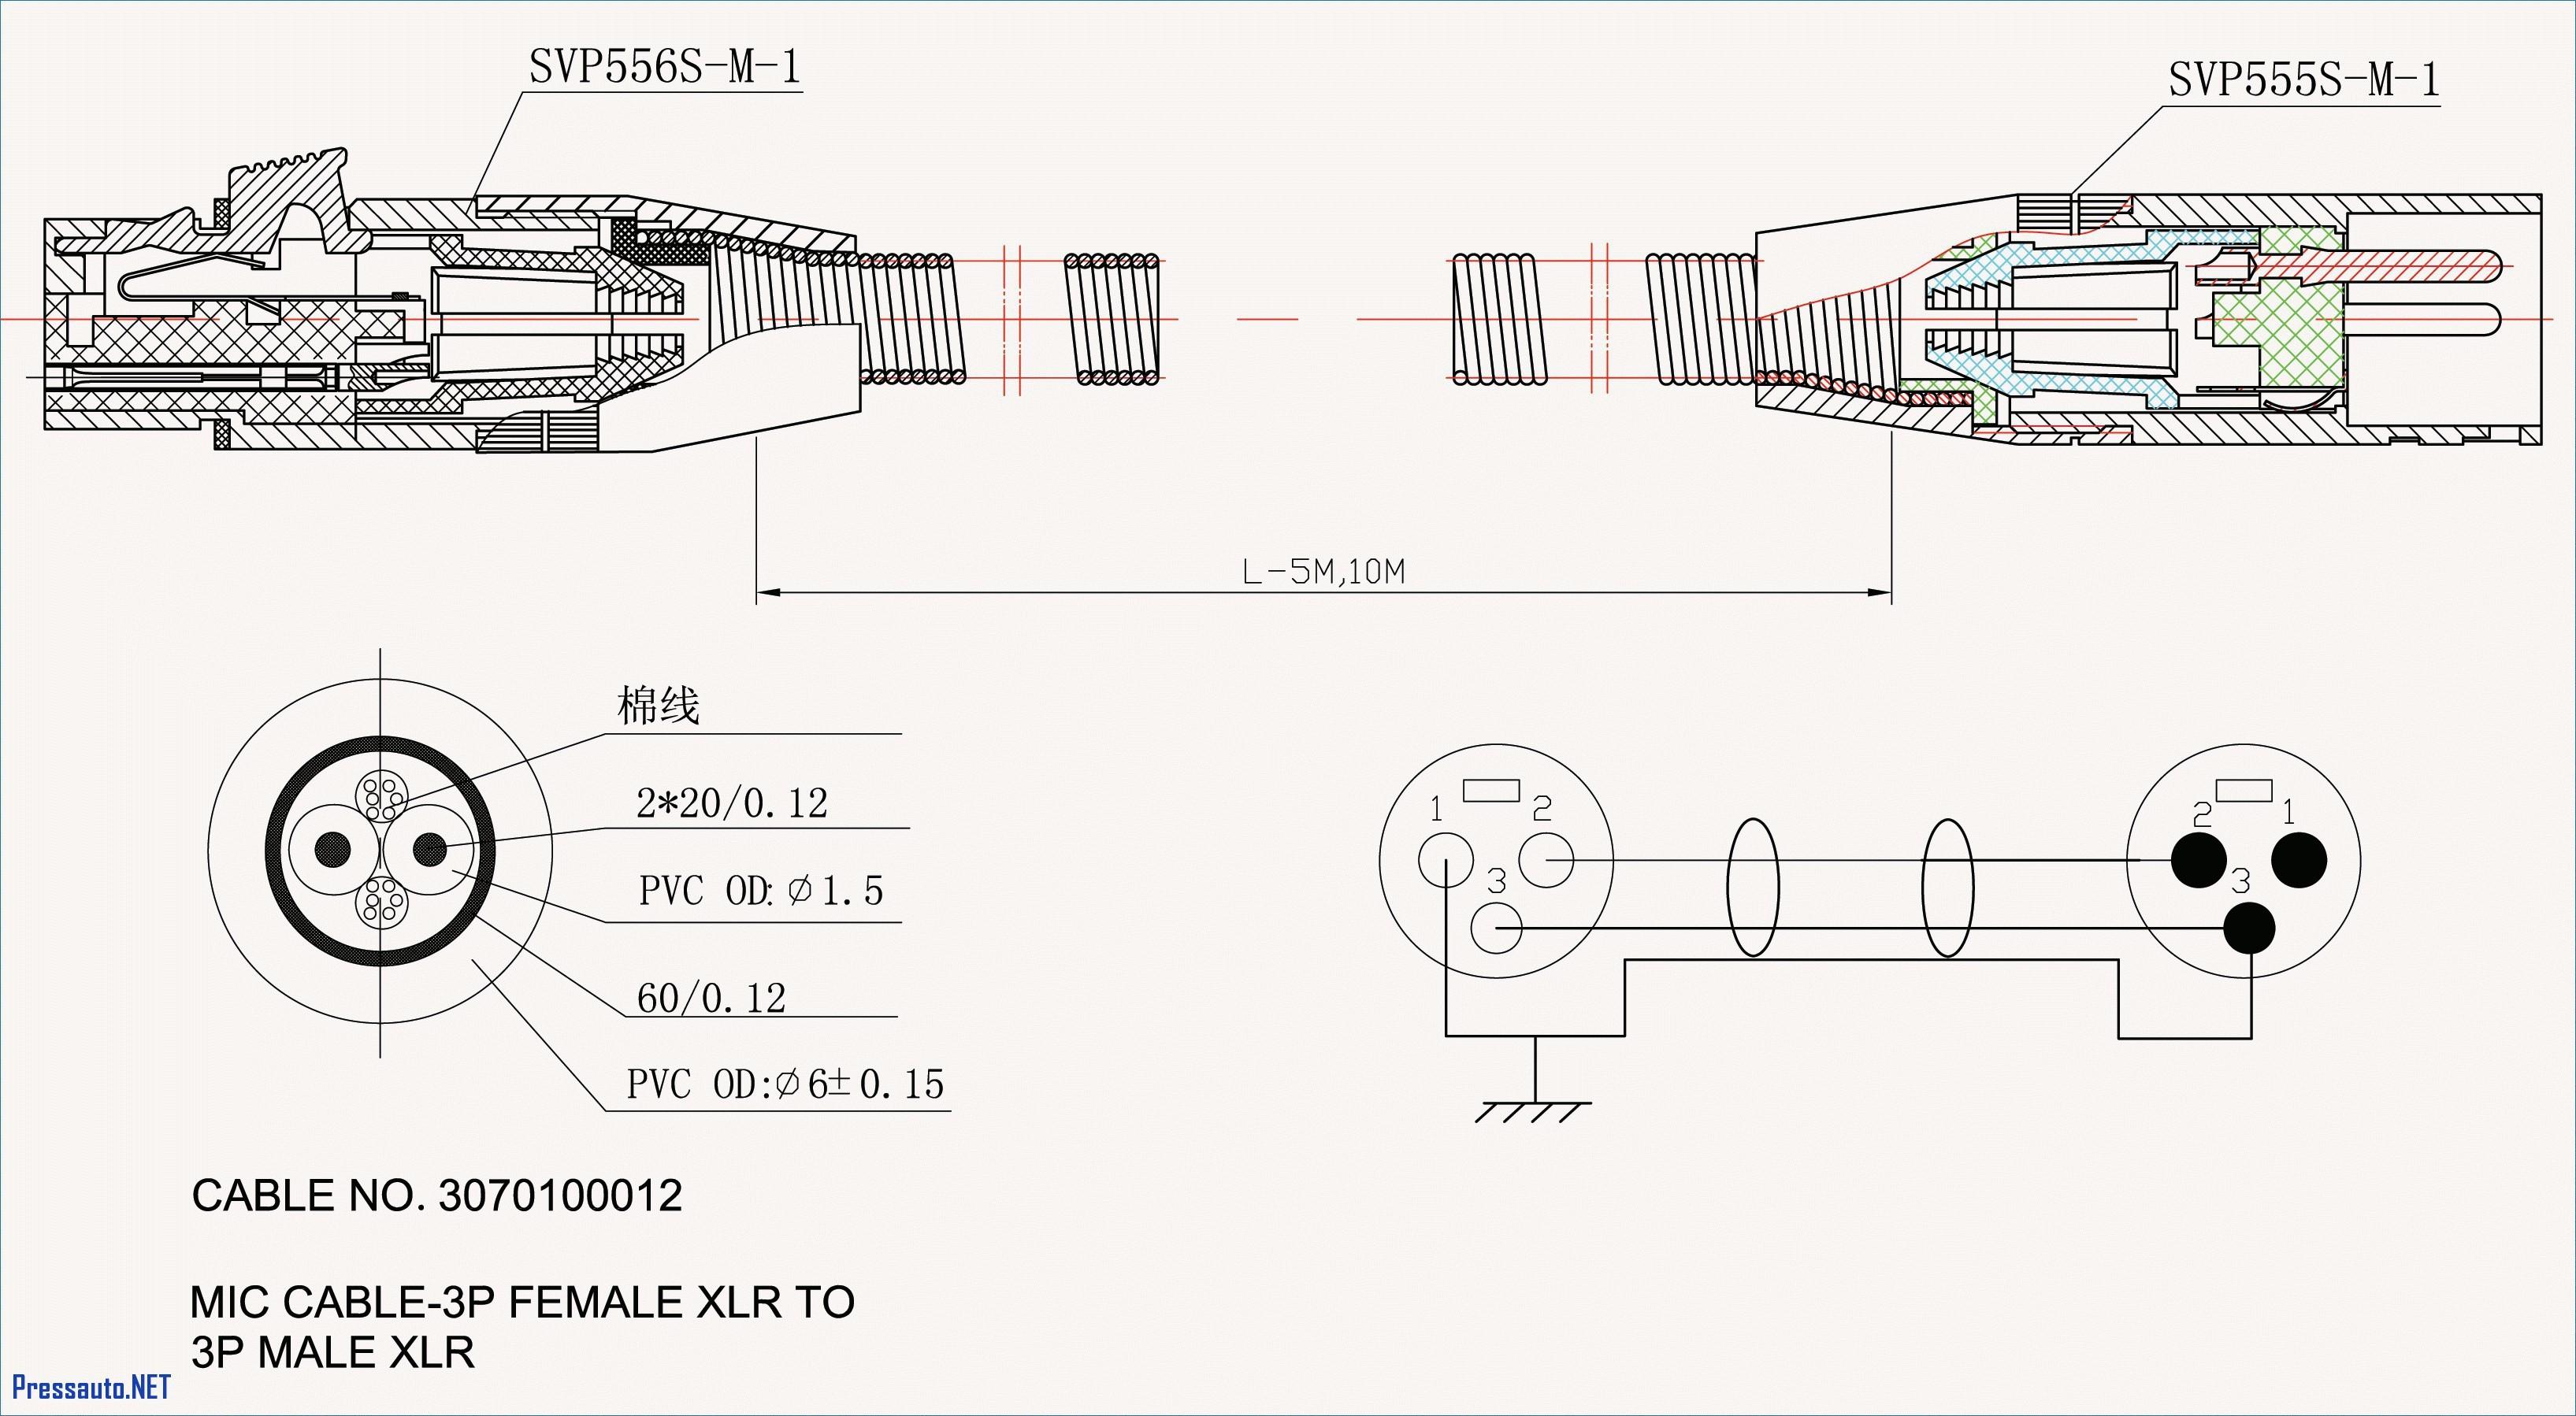 Simple Engine Diagram Xlr Wiring Block Diagram Visio Of Simple Engine Diagram